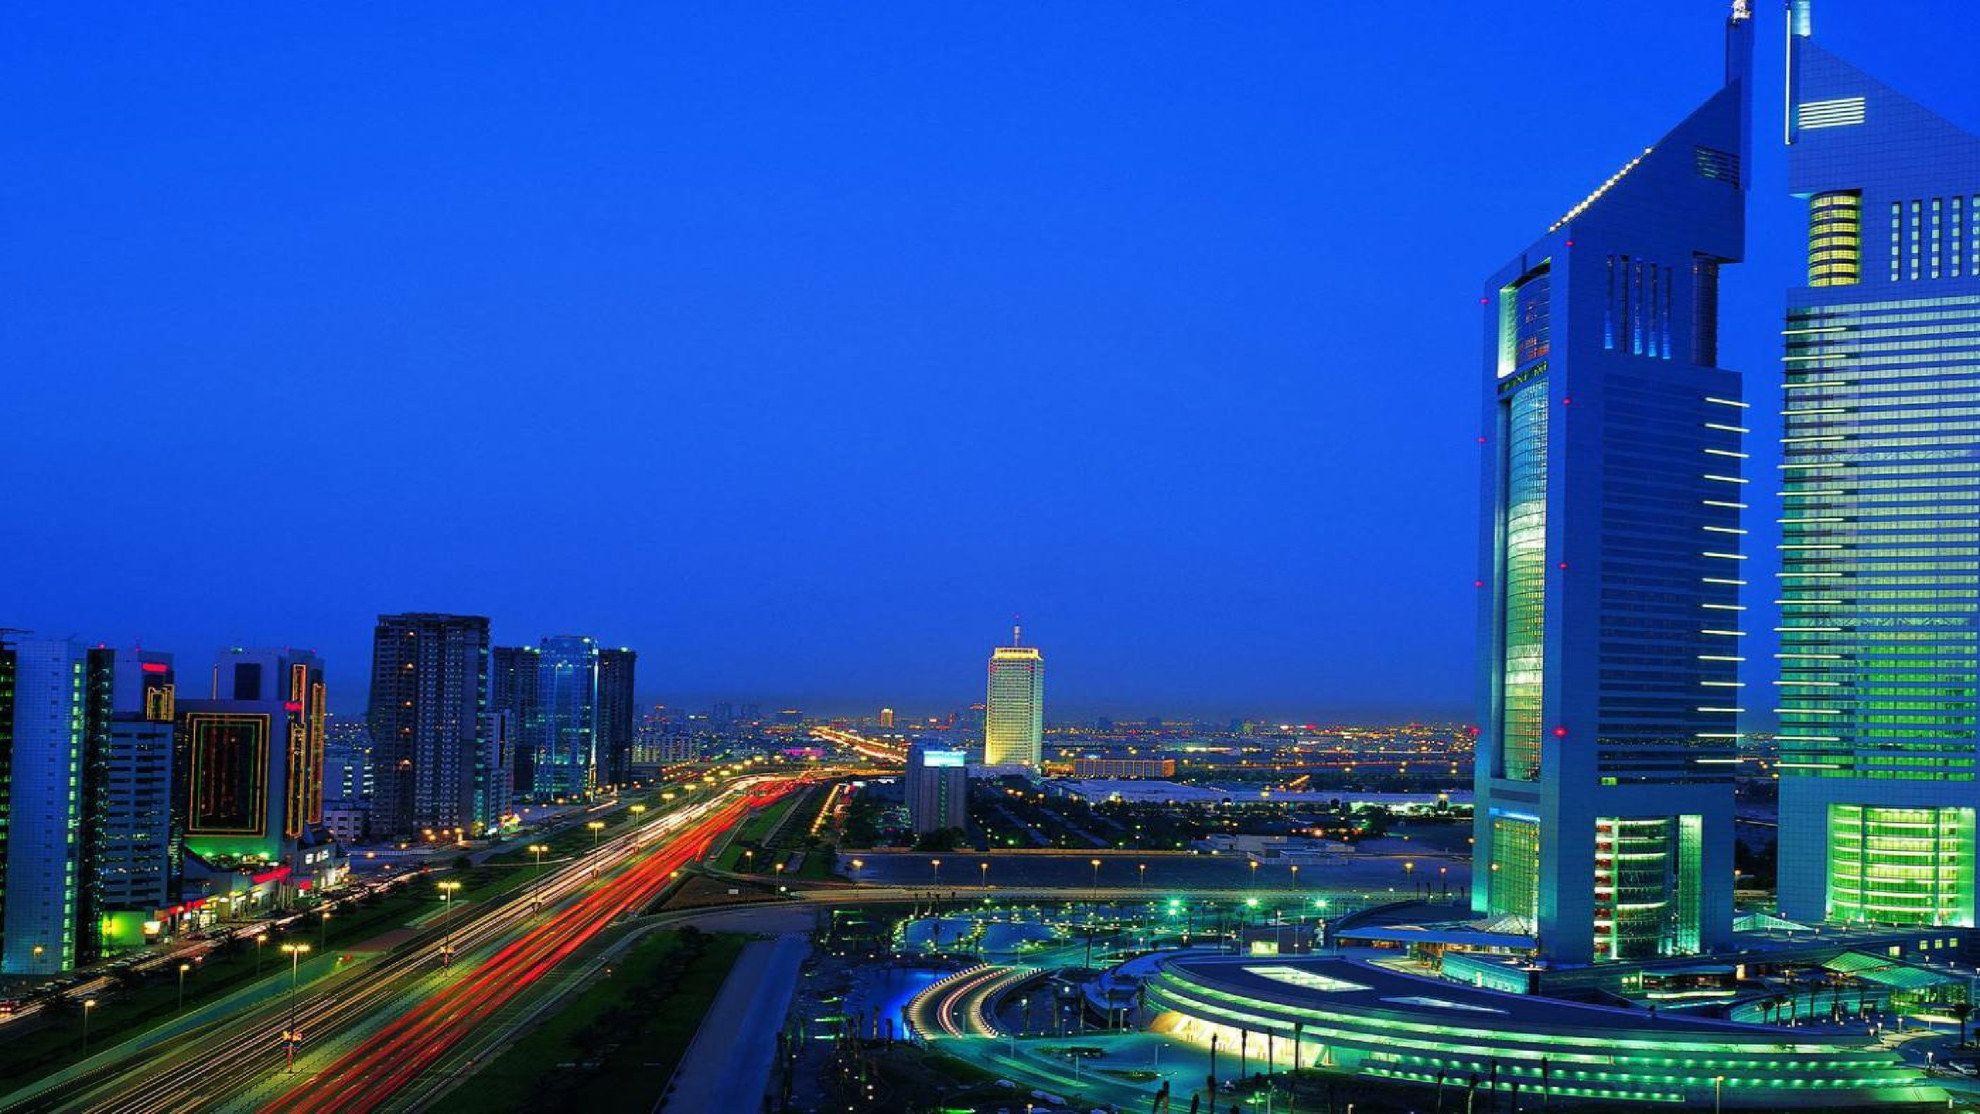 The Luxury Atlantis Palm Hotel In Dubai | Found The World  |Palm Island Dubai From Burj Hotel